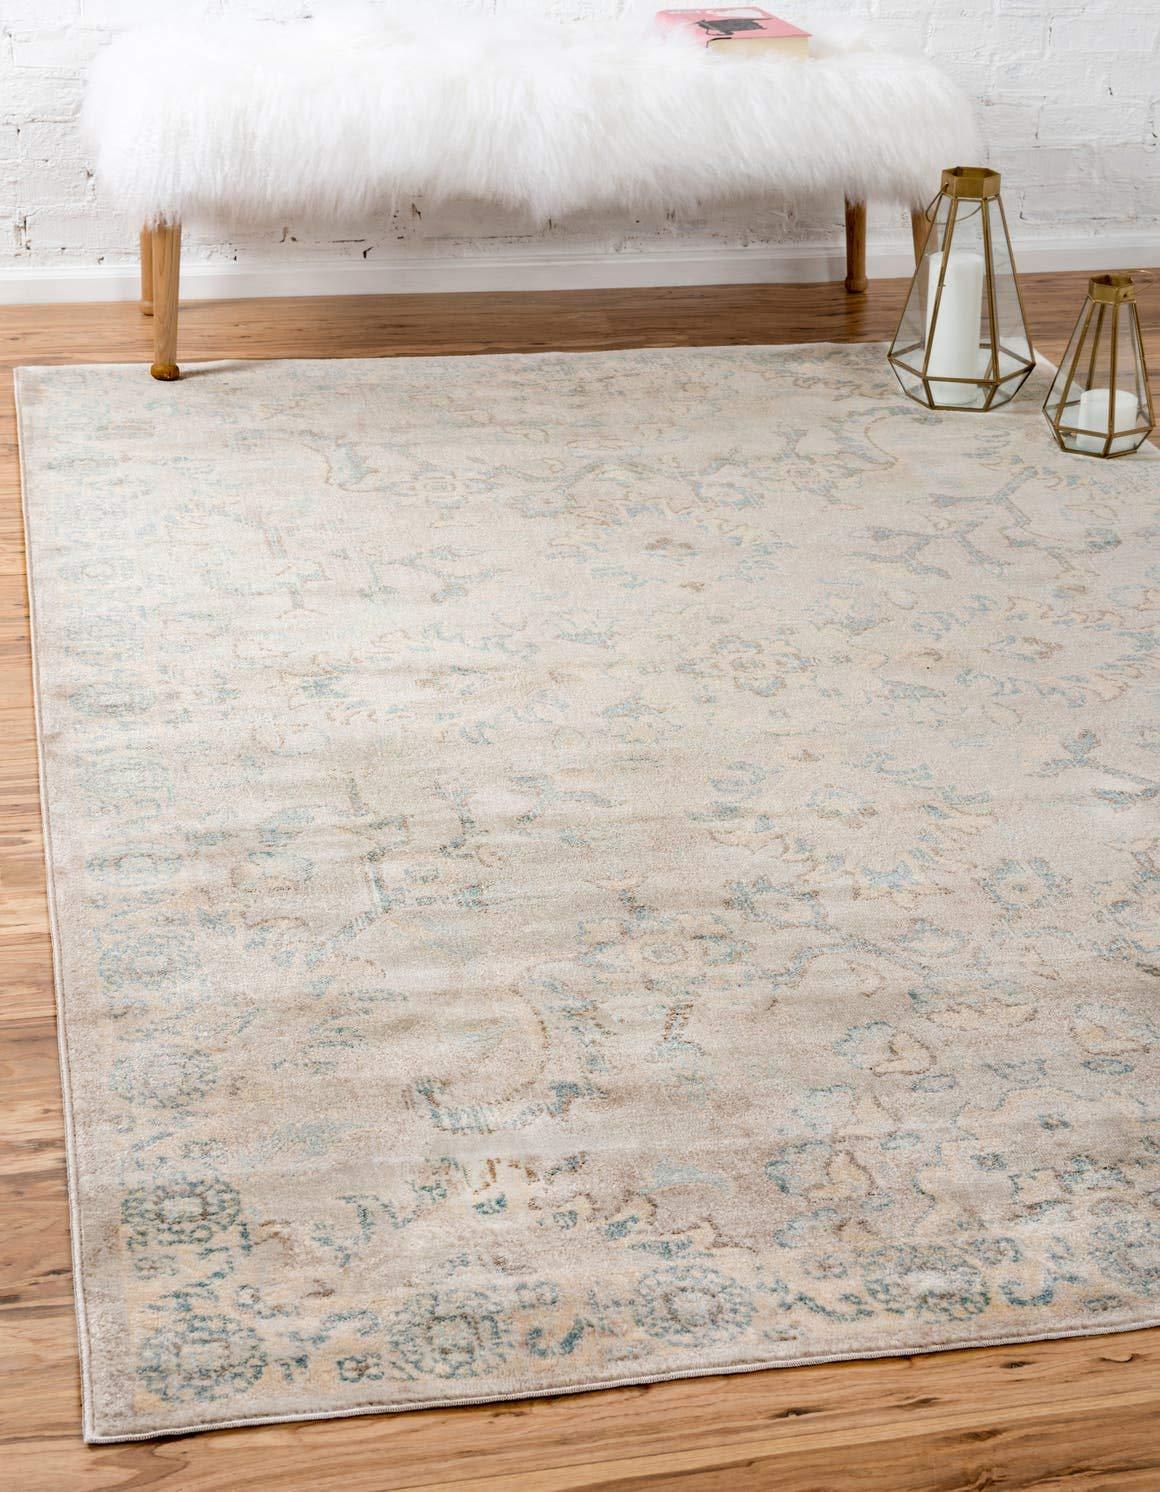 Unique Loom Paris Collection Pastel Tones Traditional Distressed Gray Area Rug 3 3 x 5 3